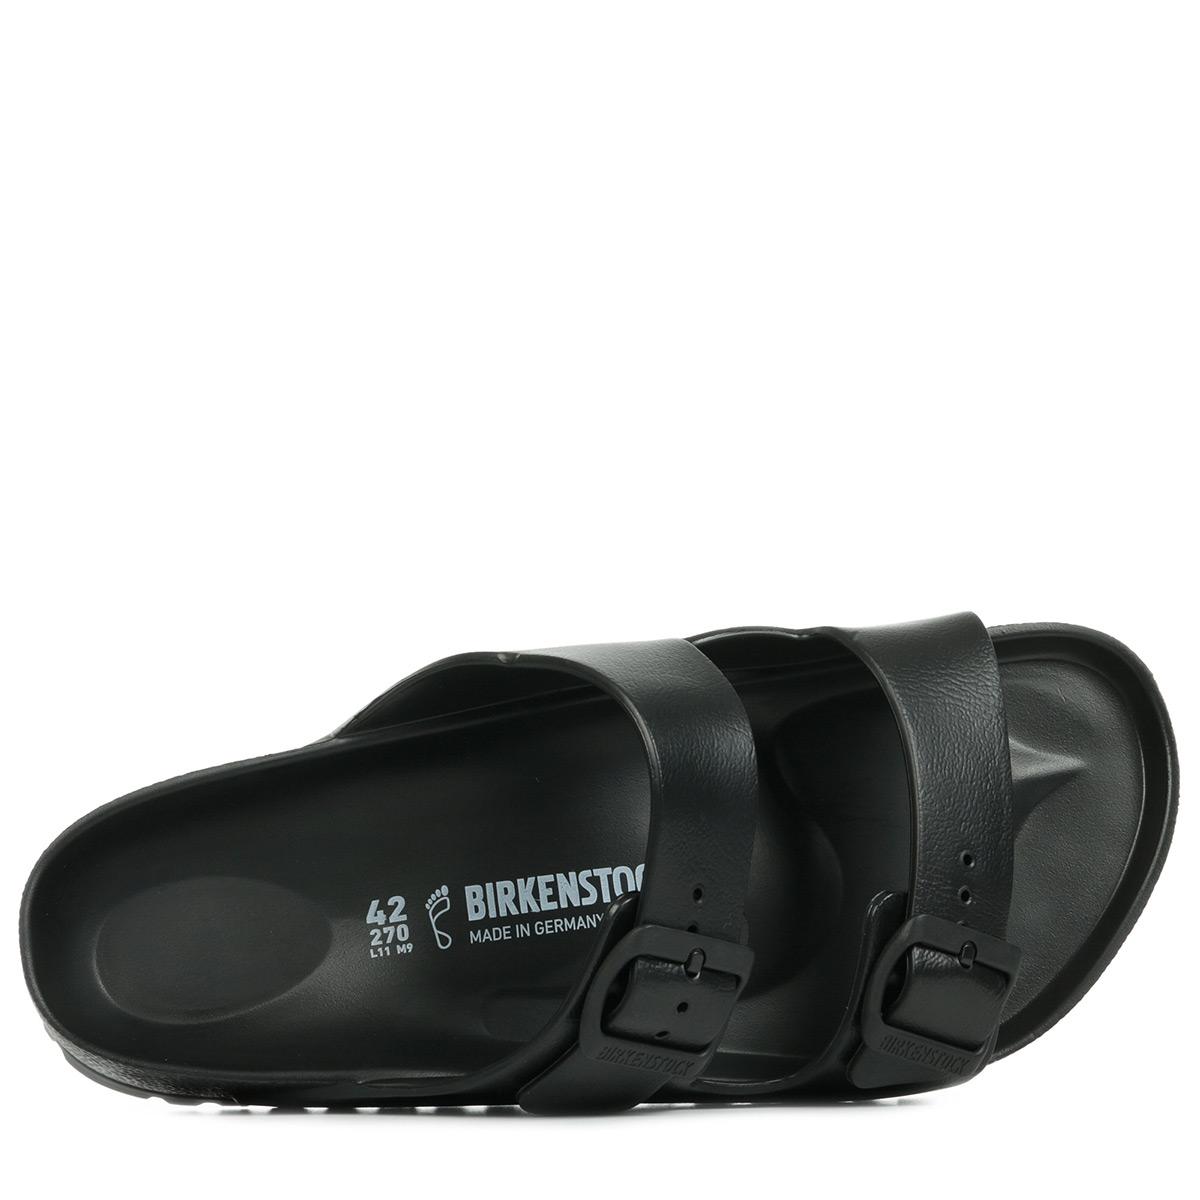 birkenstock sandal birkenstock arizona eva 42. Black Bedroom Furniture Sets. Home Design Ideas